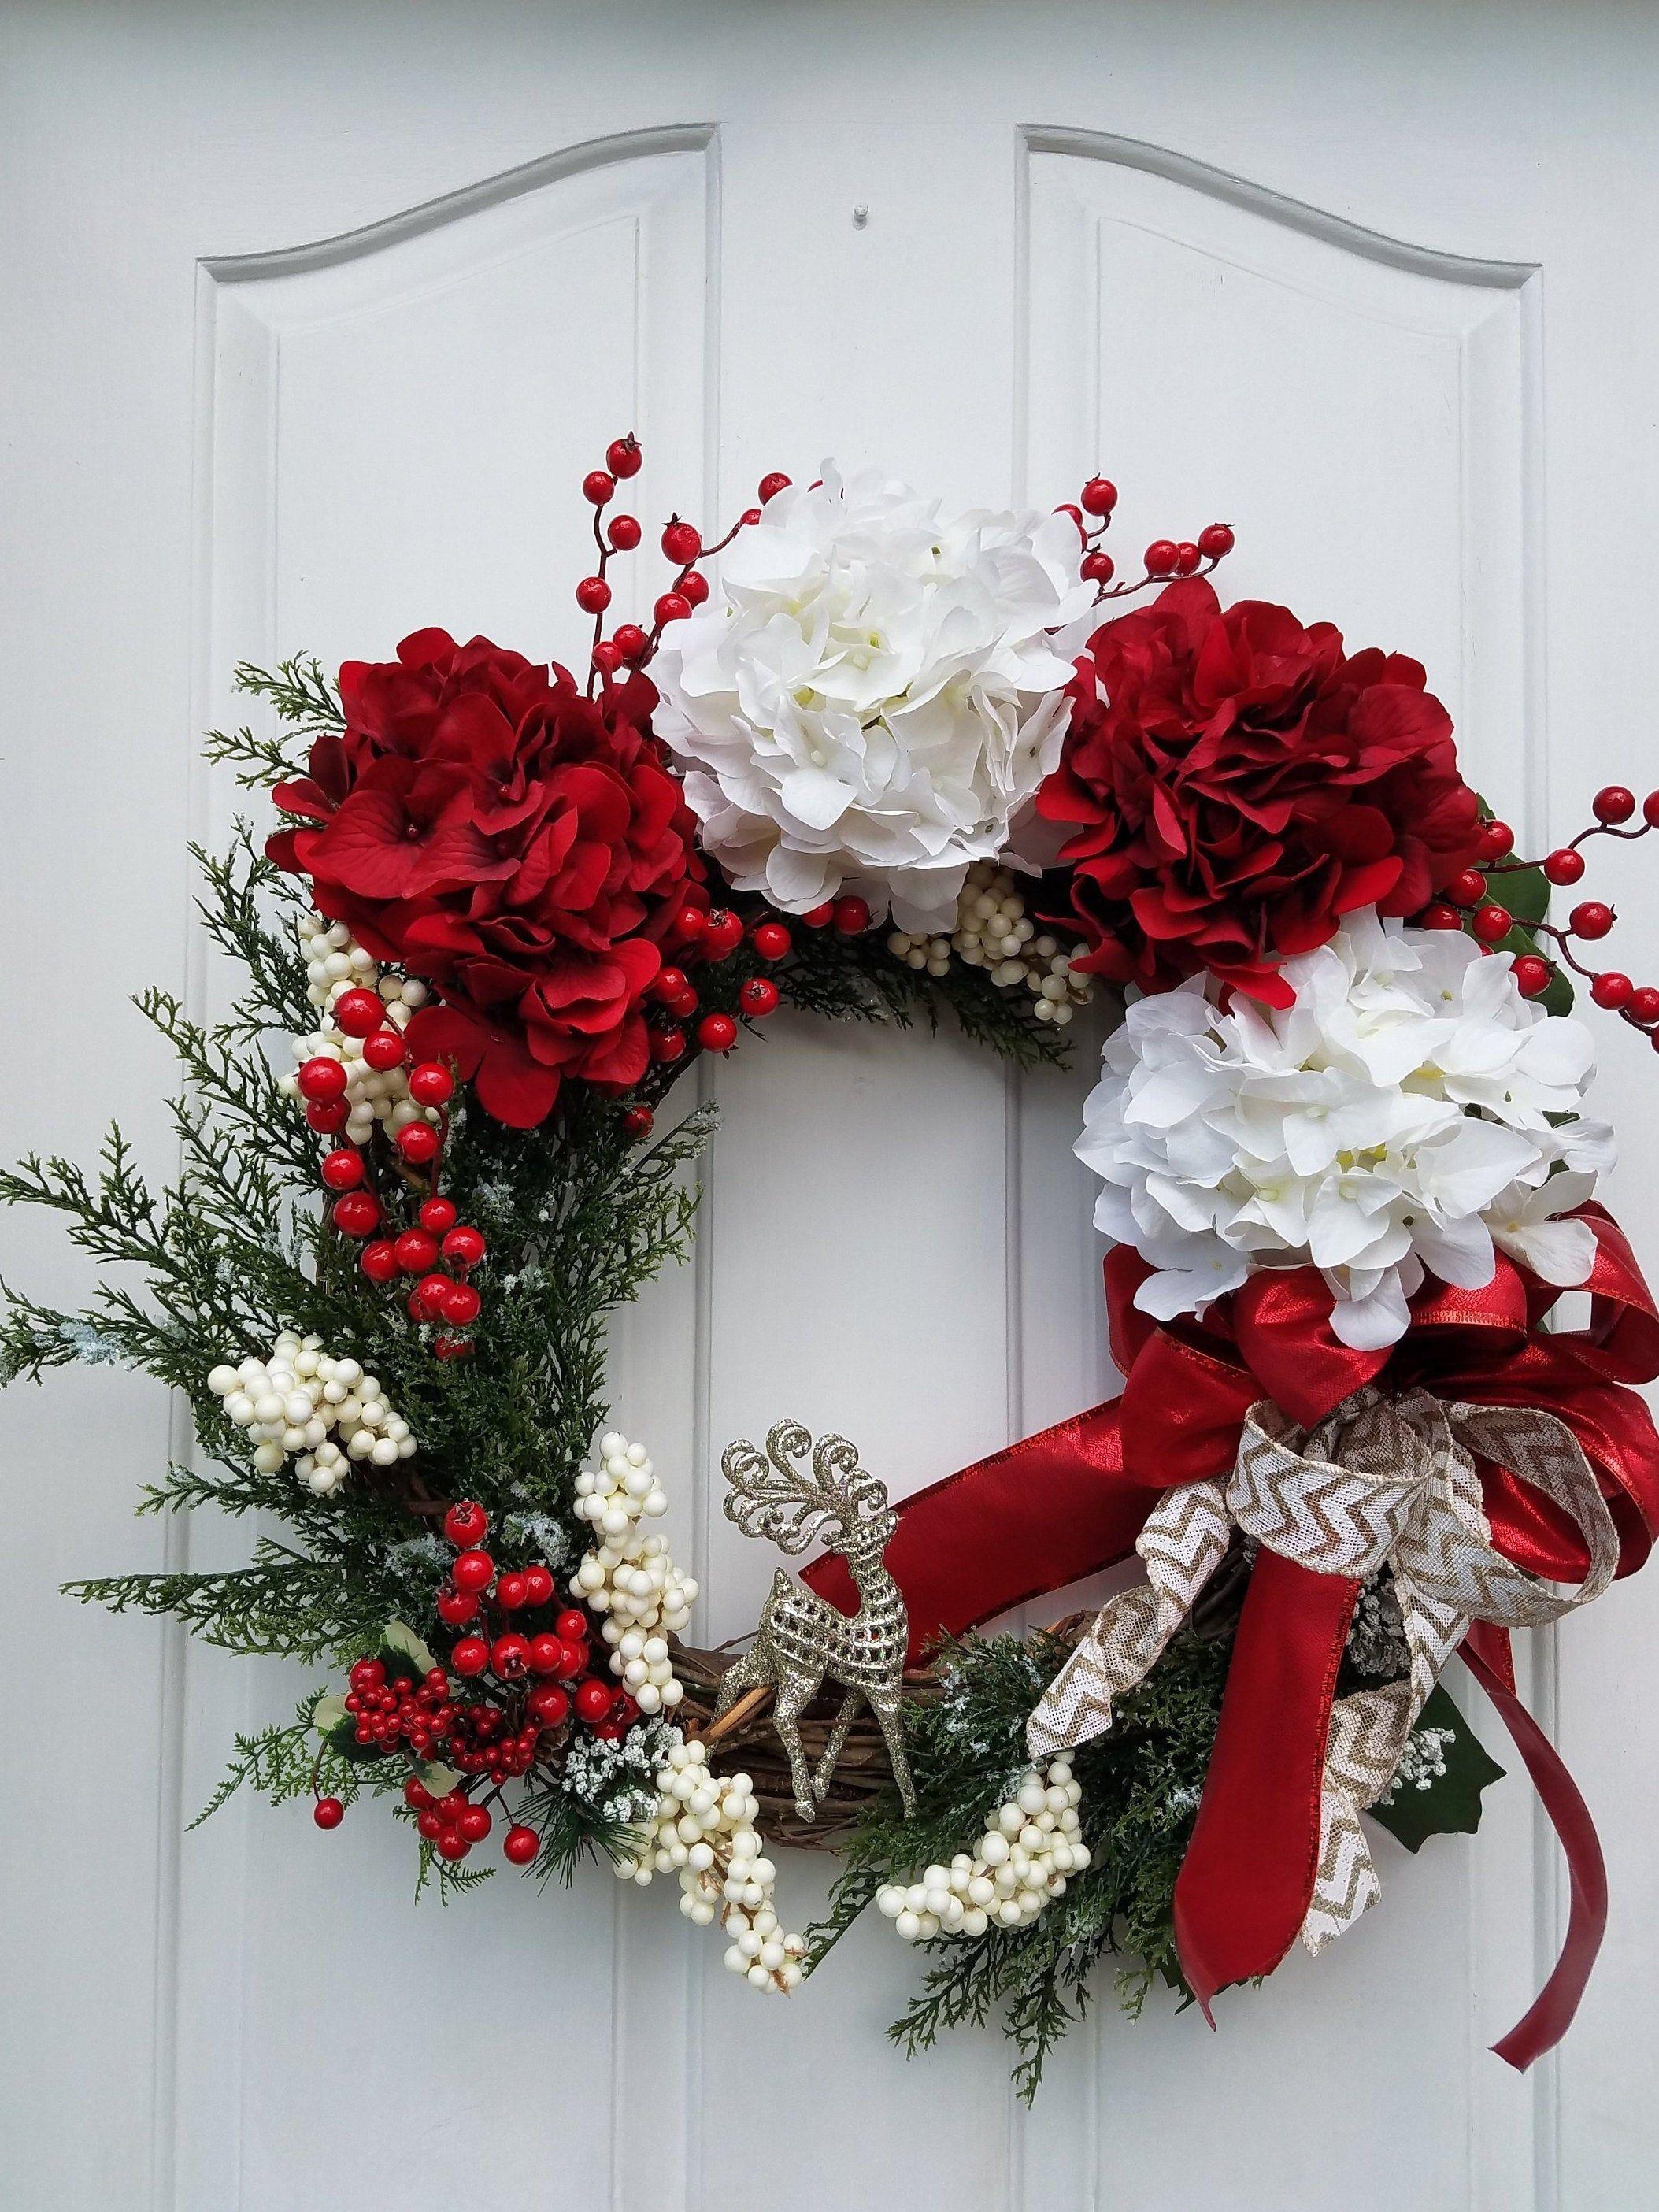 Winter Wreath for Front Door, All Season Wreath, Family ...